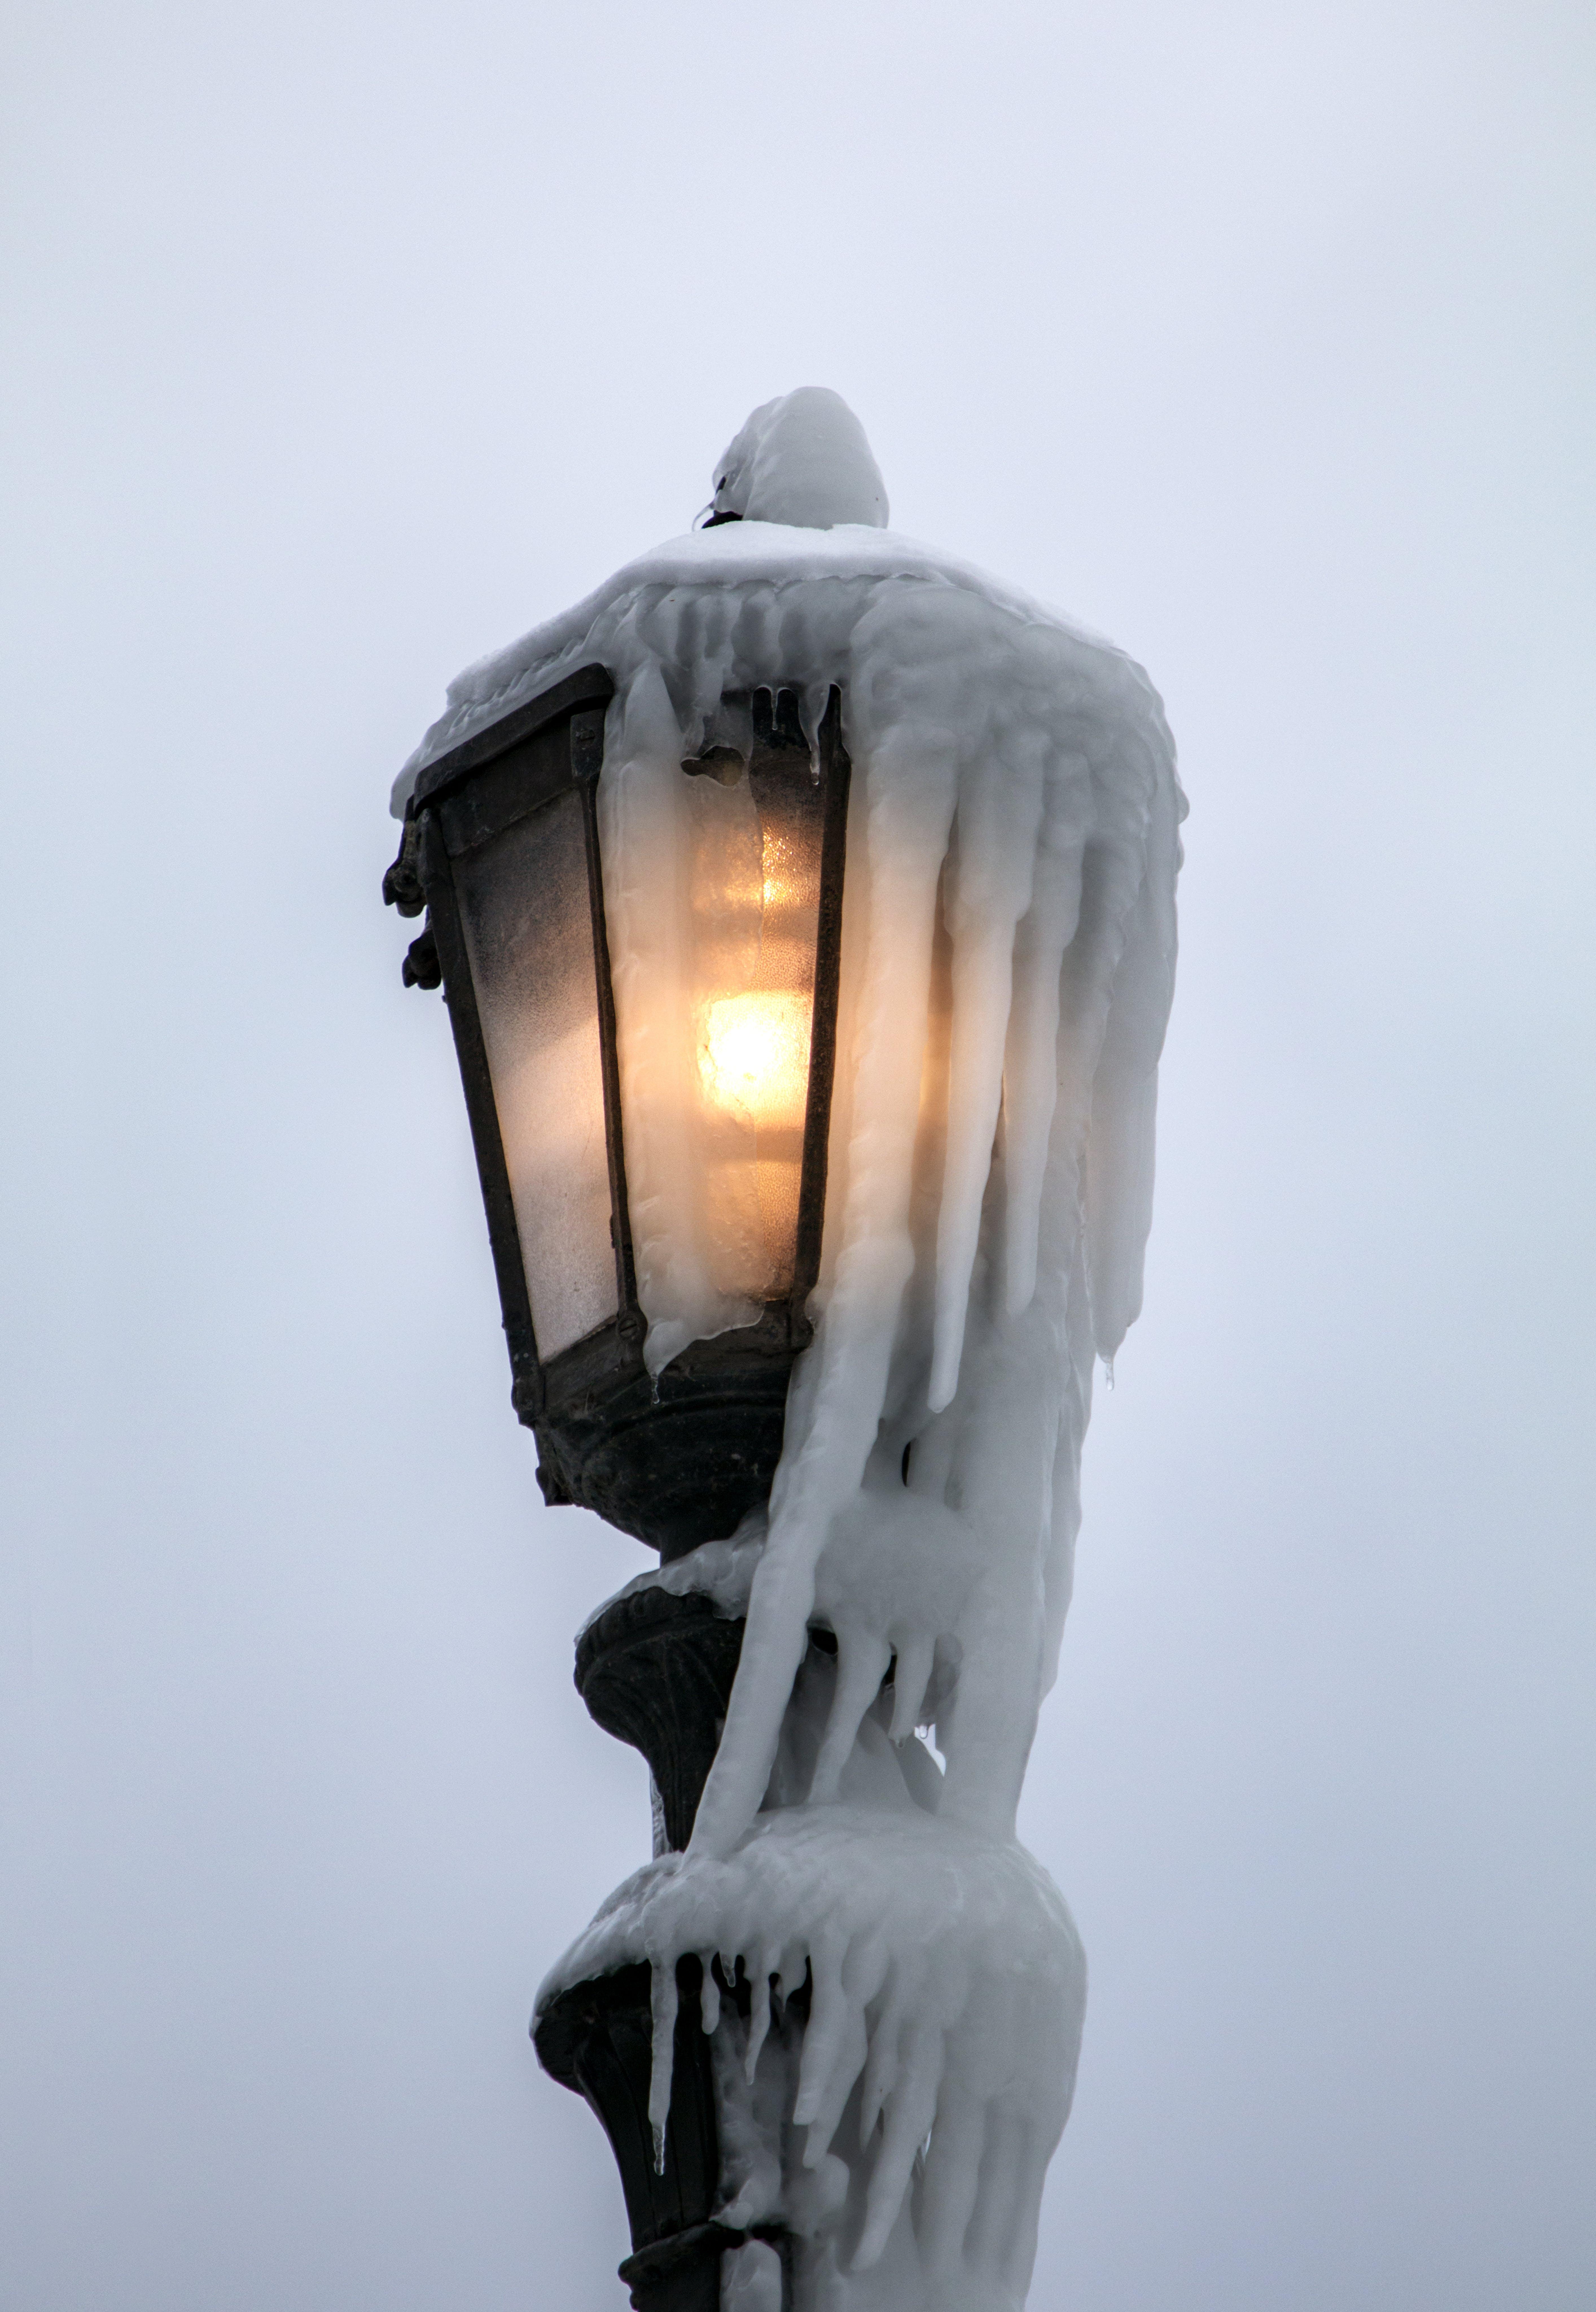 Free stock photo of frozen, ice, lamp, lamp post